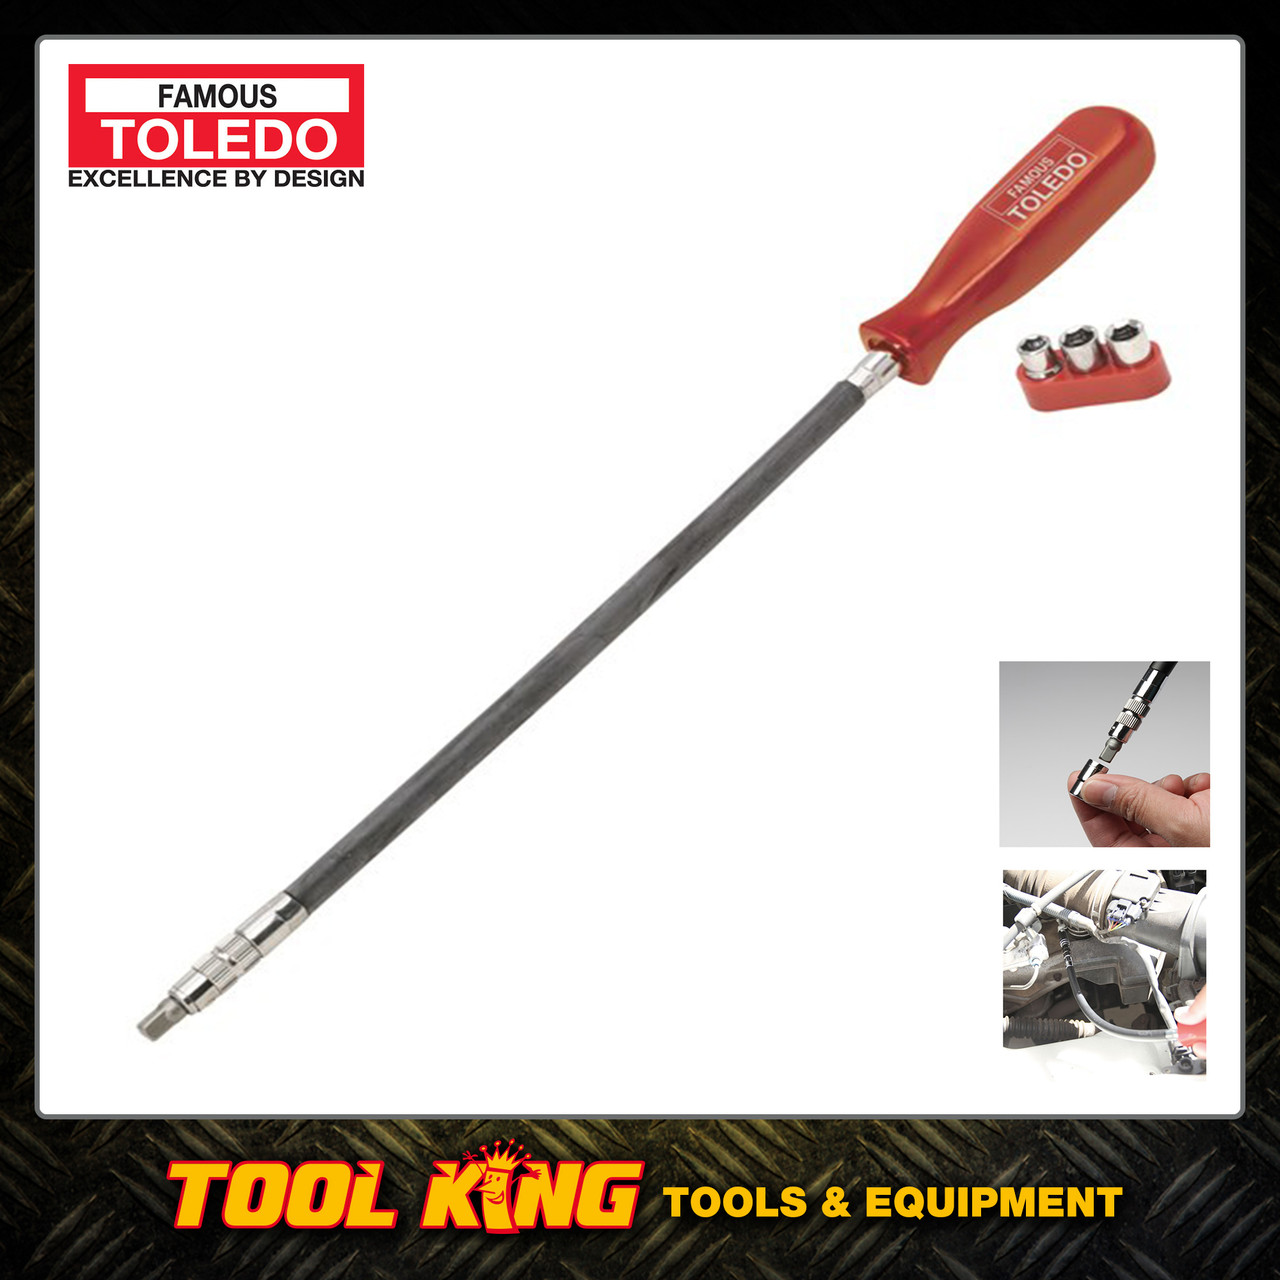 Hose clamp nut driver 300mm flexible TOLEDO professional